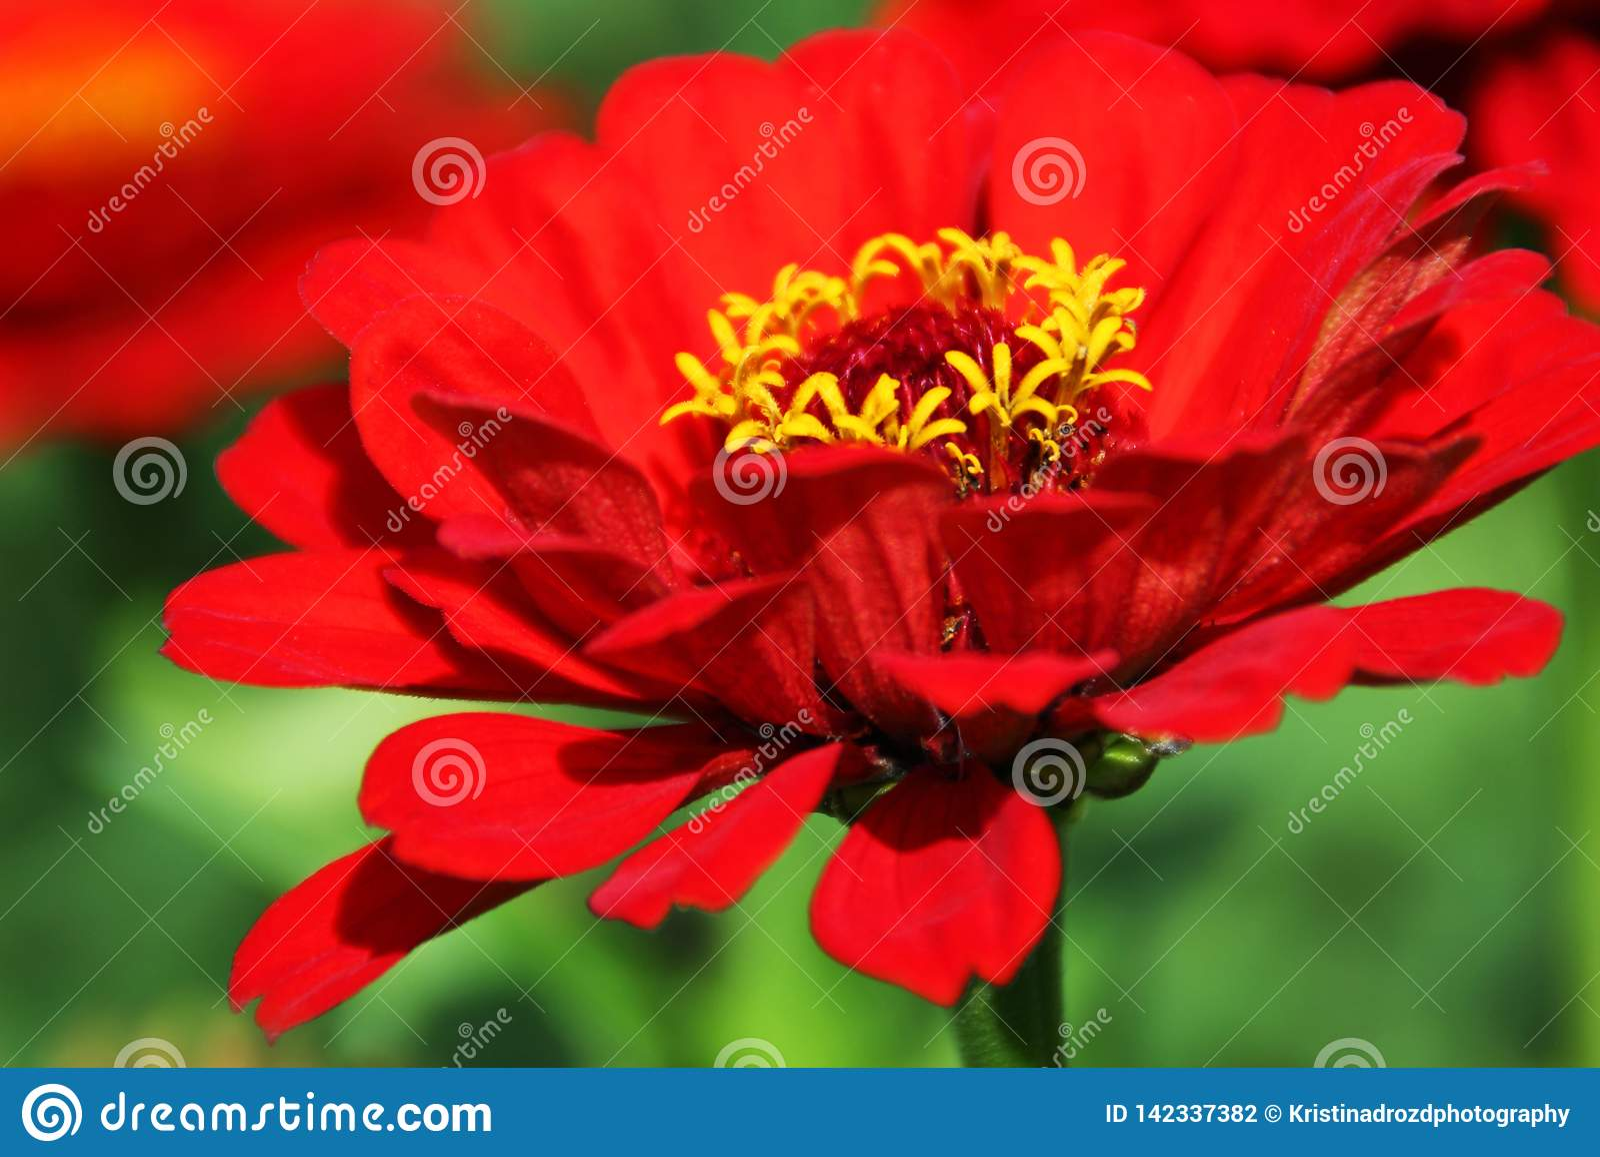 Fleur rouge de zinnia dans un jardin luxuriant